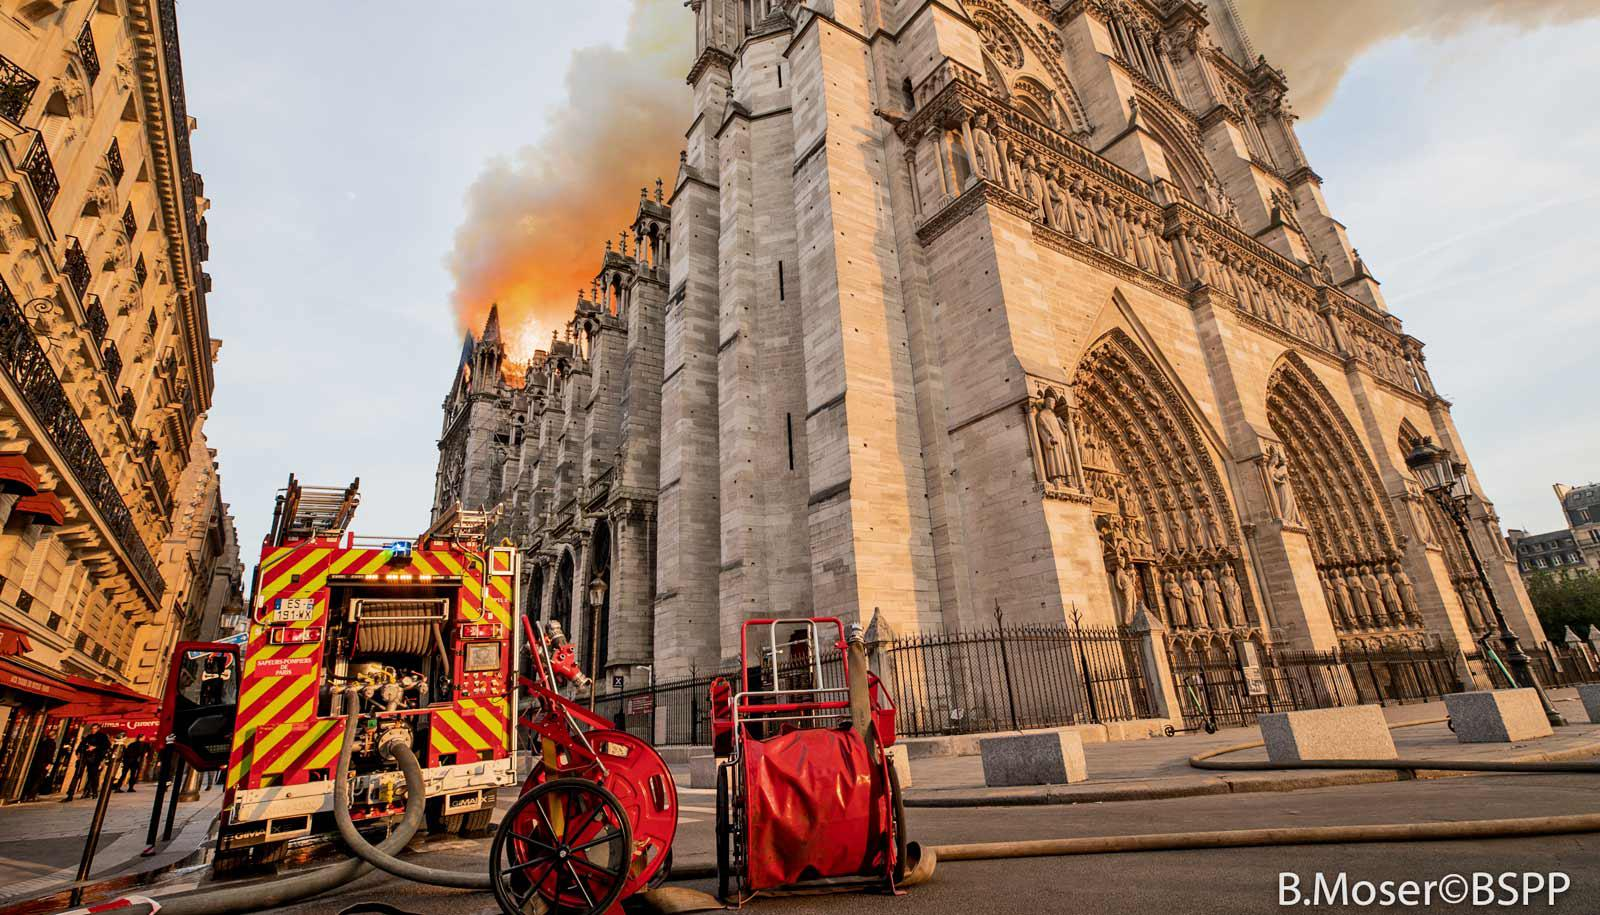 fire truck near Notre Dame as it burns